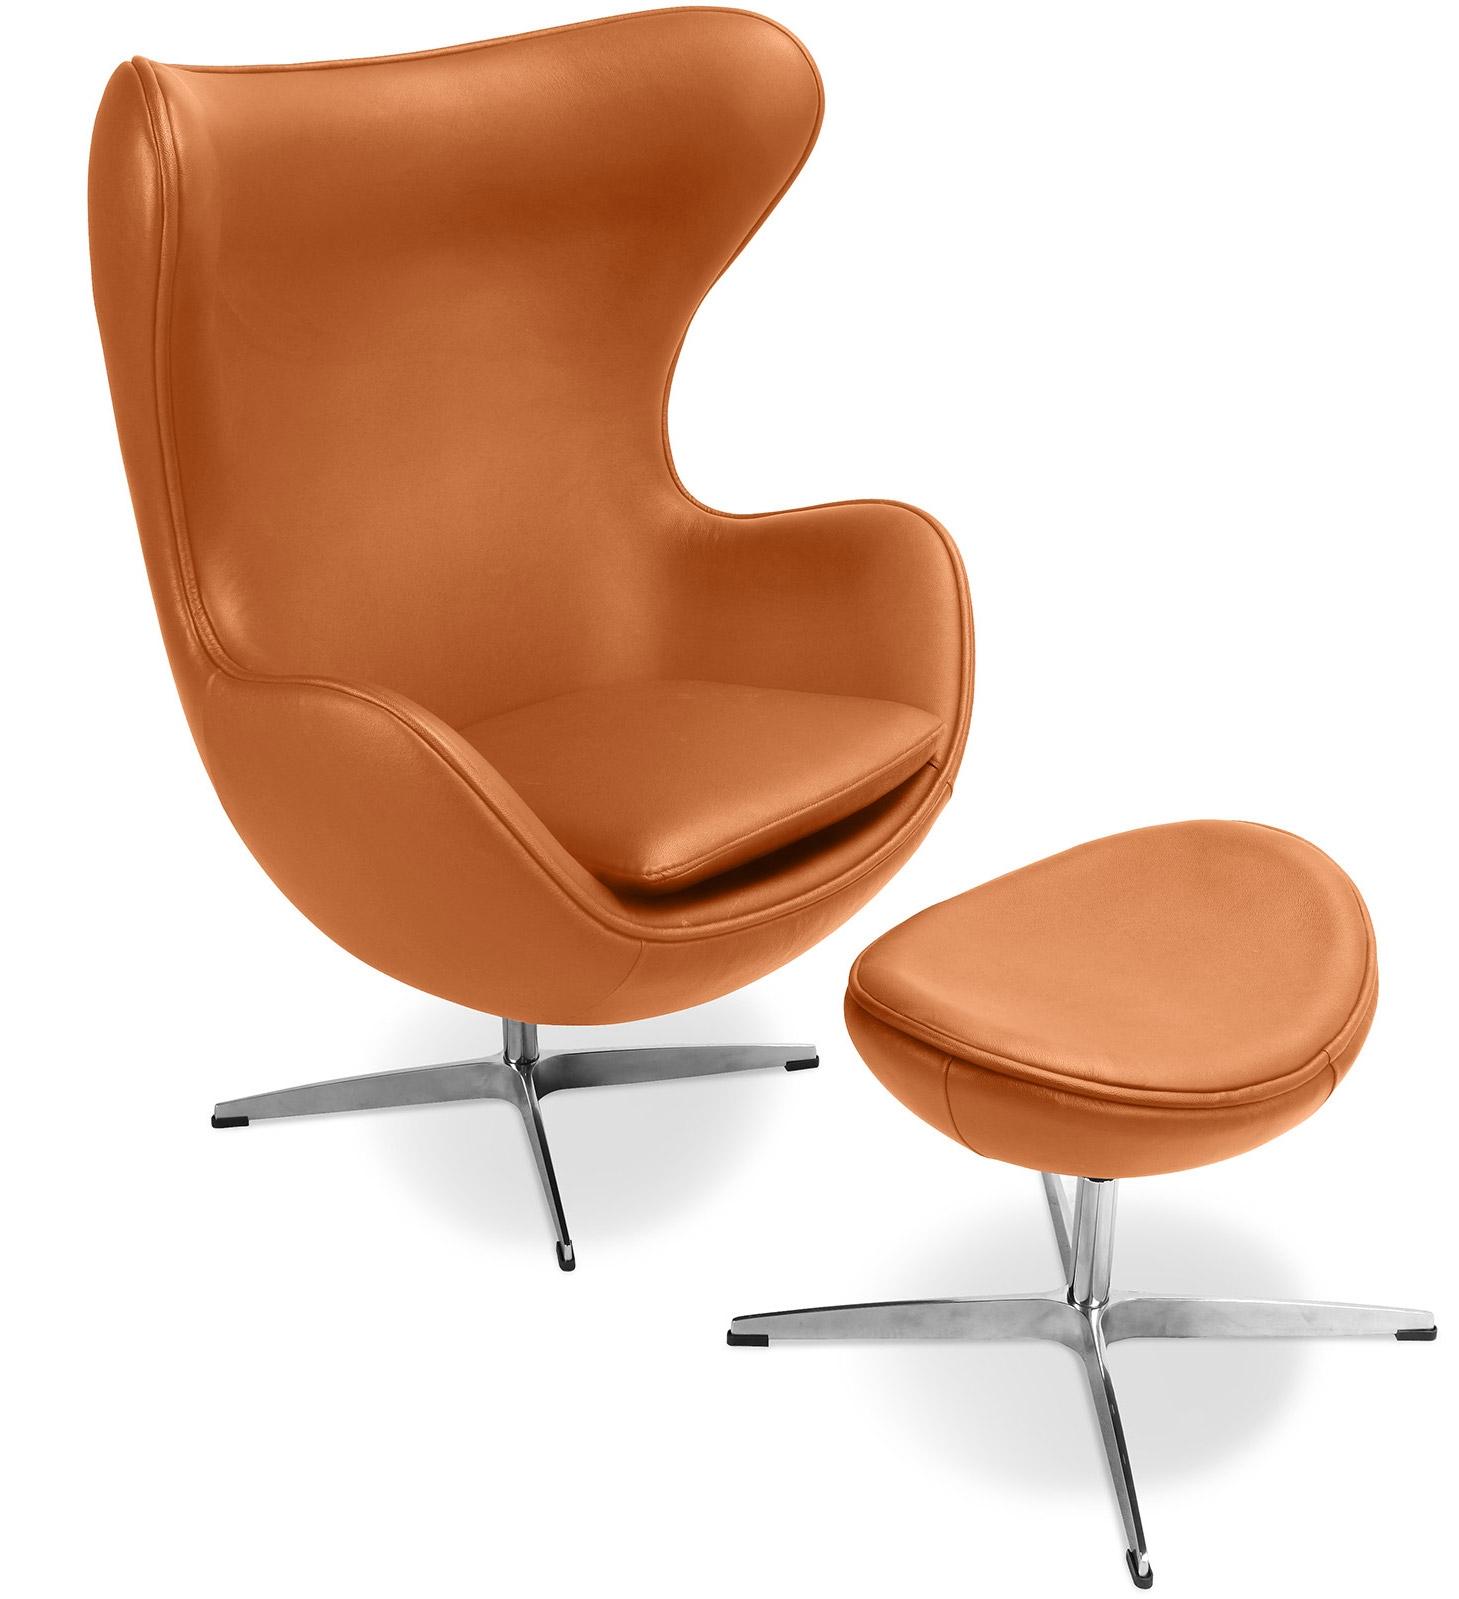 fauteuil avec repose pieds cuir camel ego. Black Bedroom Furniture Sets. Home Design Ideas